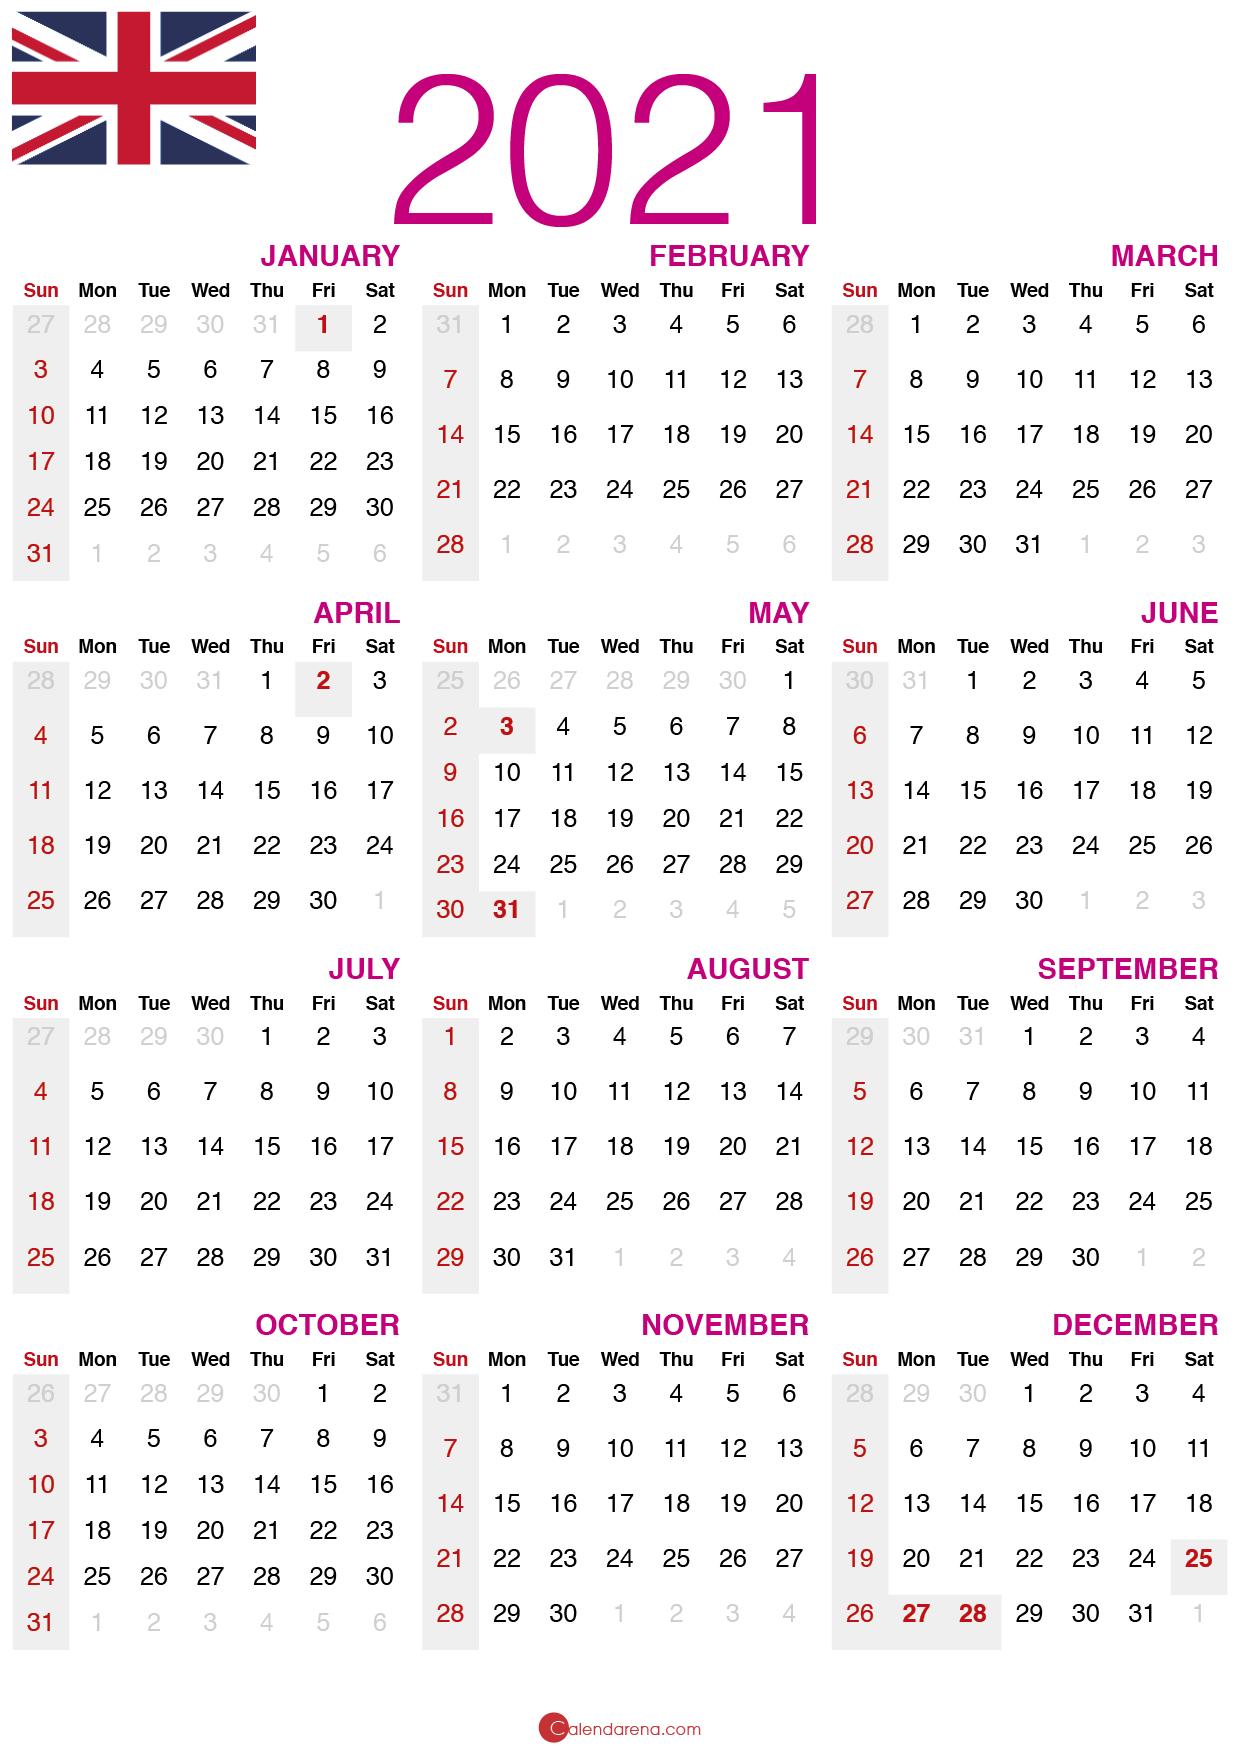 Download Free 2021 calendar UK 🇬🇧 (United Kingdom ...